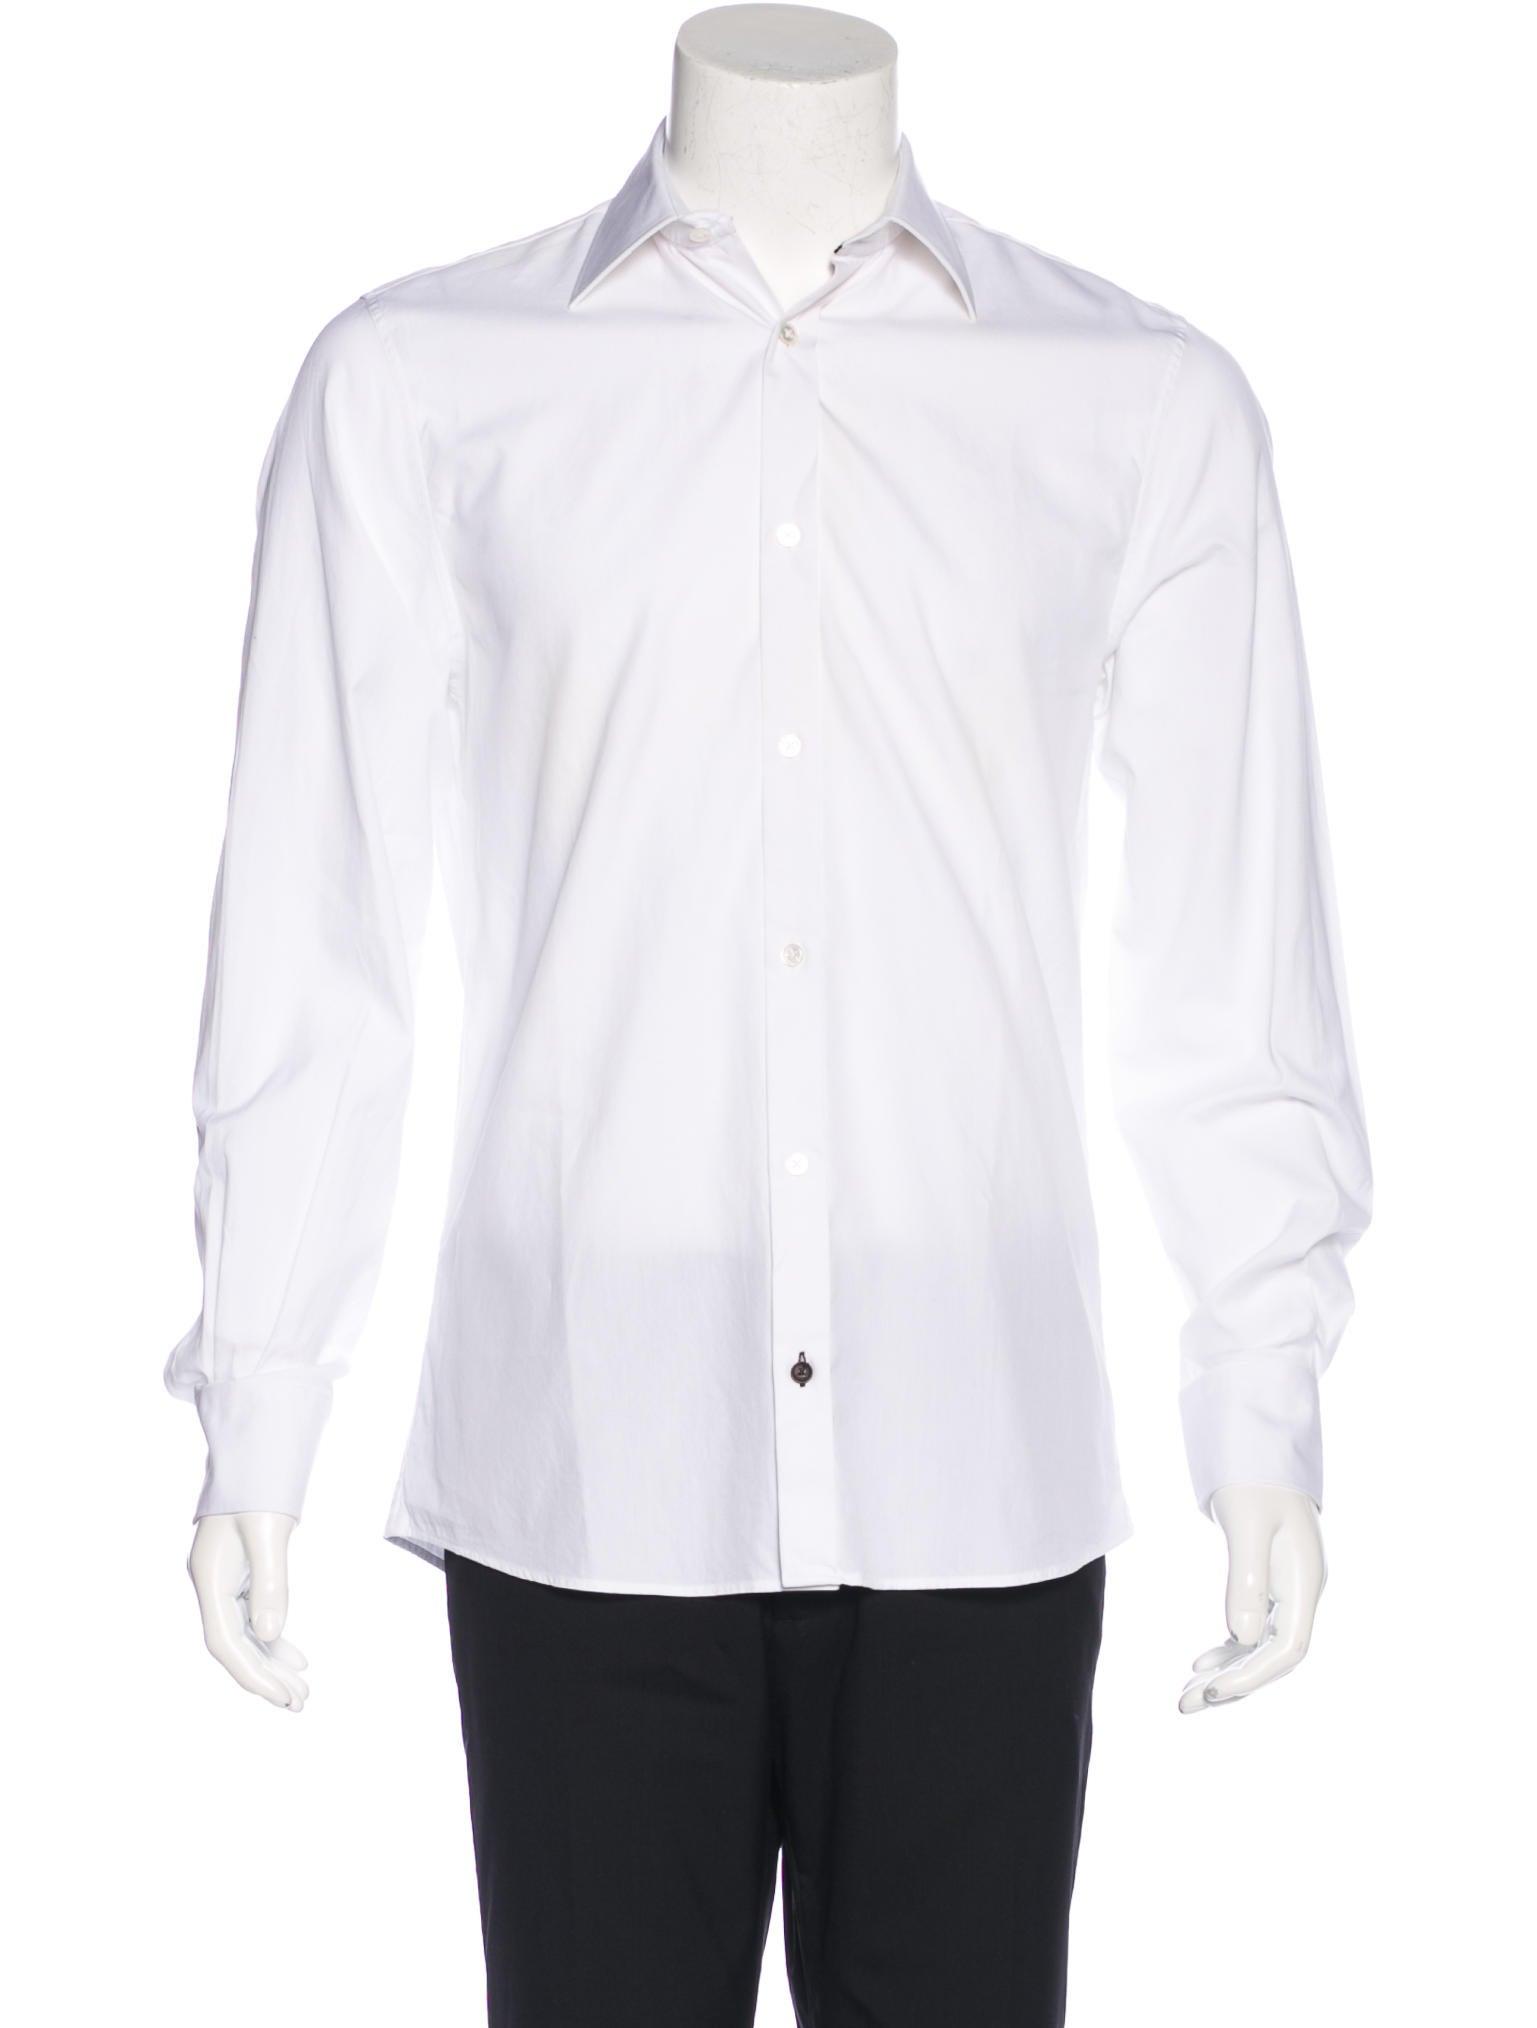 Louis vuitton woven dress shirt w tags clothing Woven t shirt tags